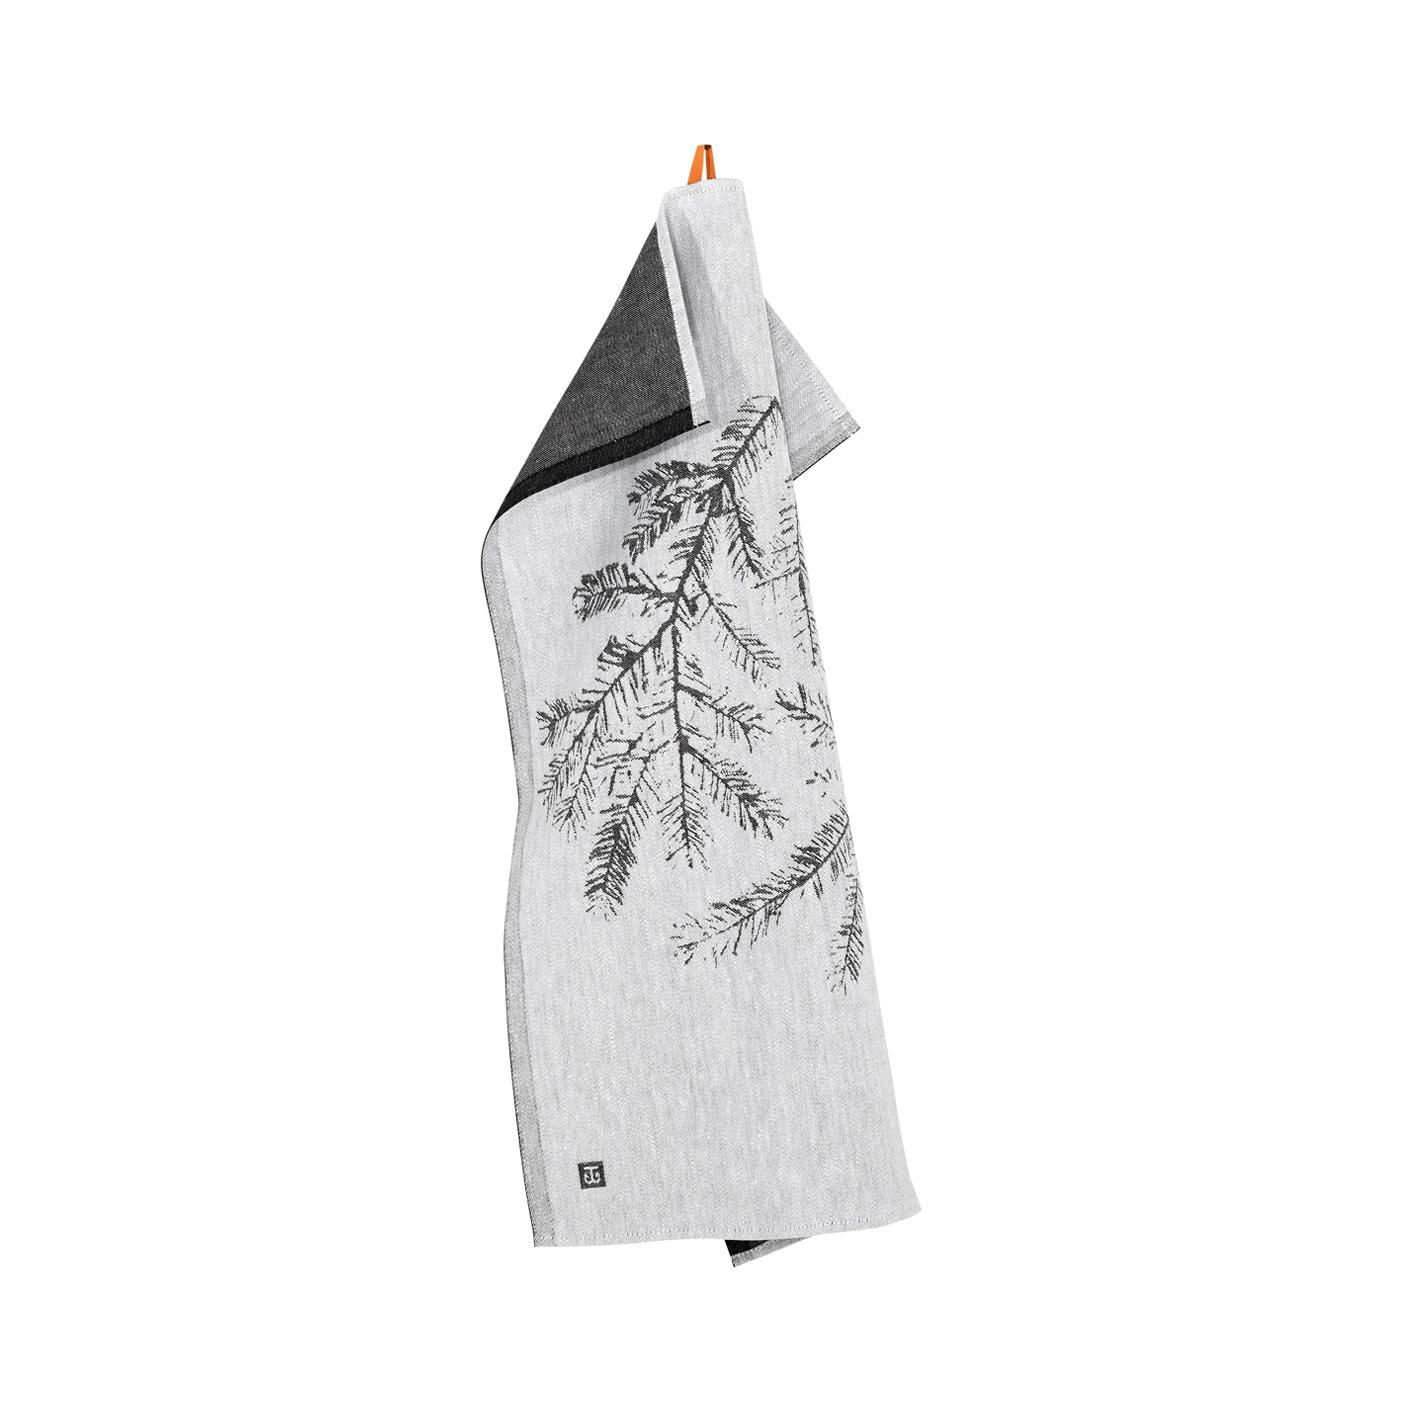 Spruce branch tea towel